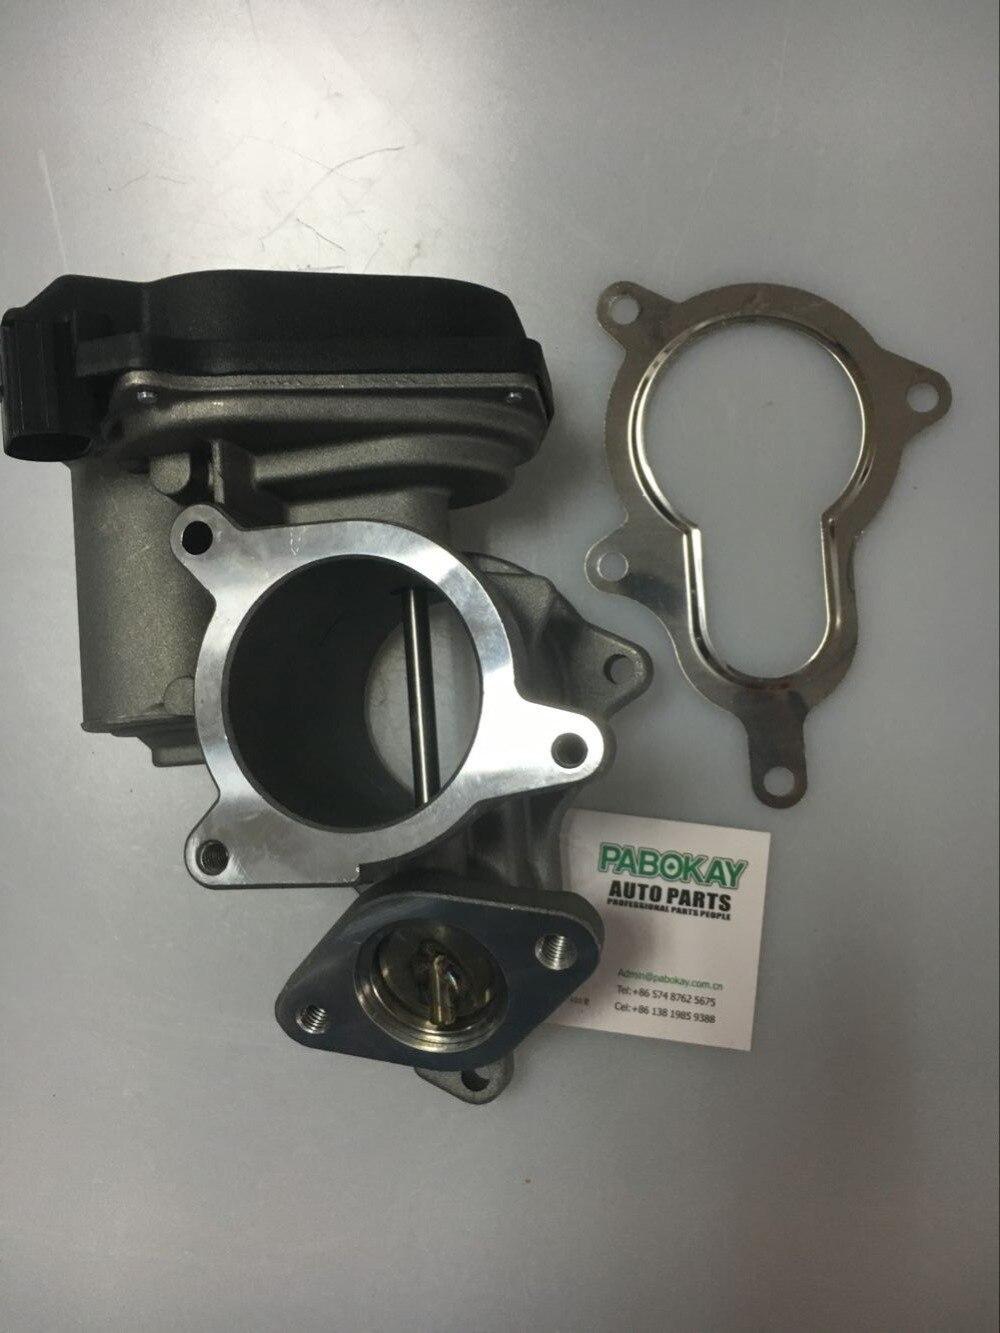 ФОТО FOR AUDI A3 A4 A6 Skoda Octavia Roomster Praktik VW Polo EGR VALVE 03G131501Q 408-275-002-001Z 408275002001Z A2C53060455